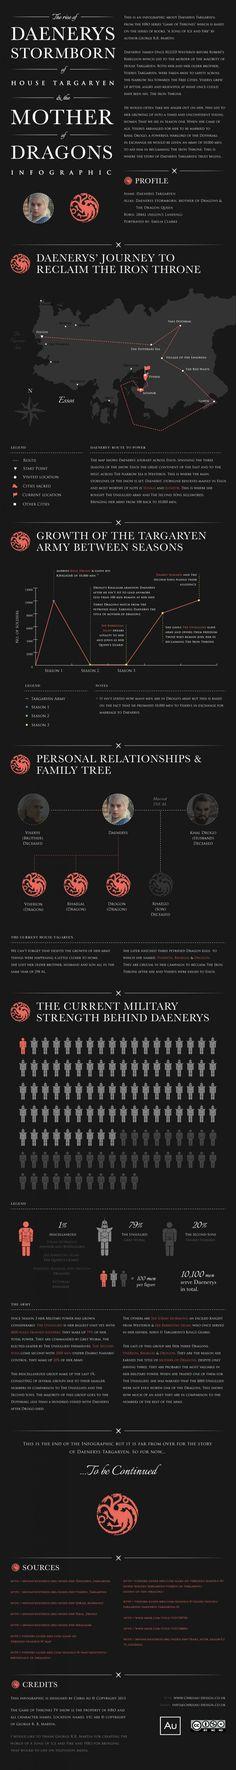 Game of Thrones: Daenerys Targaryen Infographic